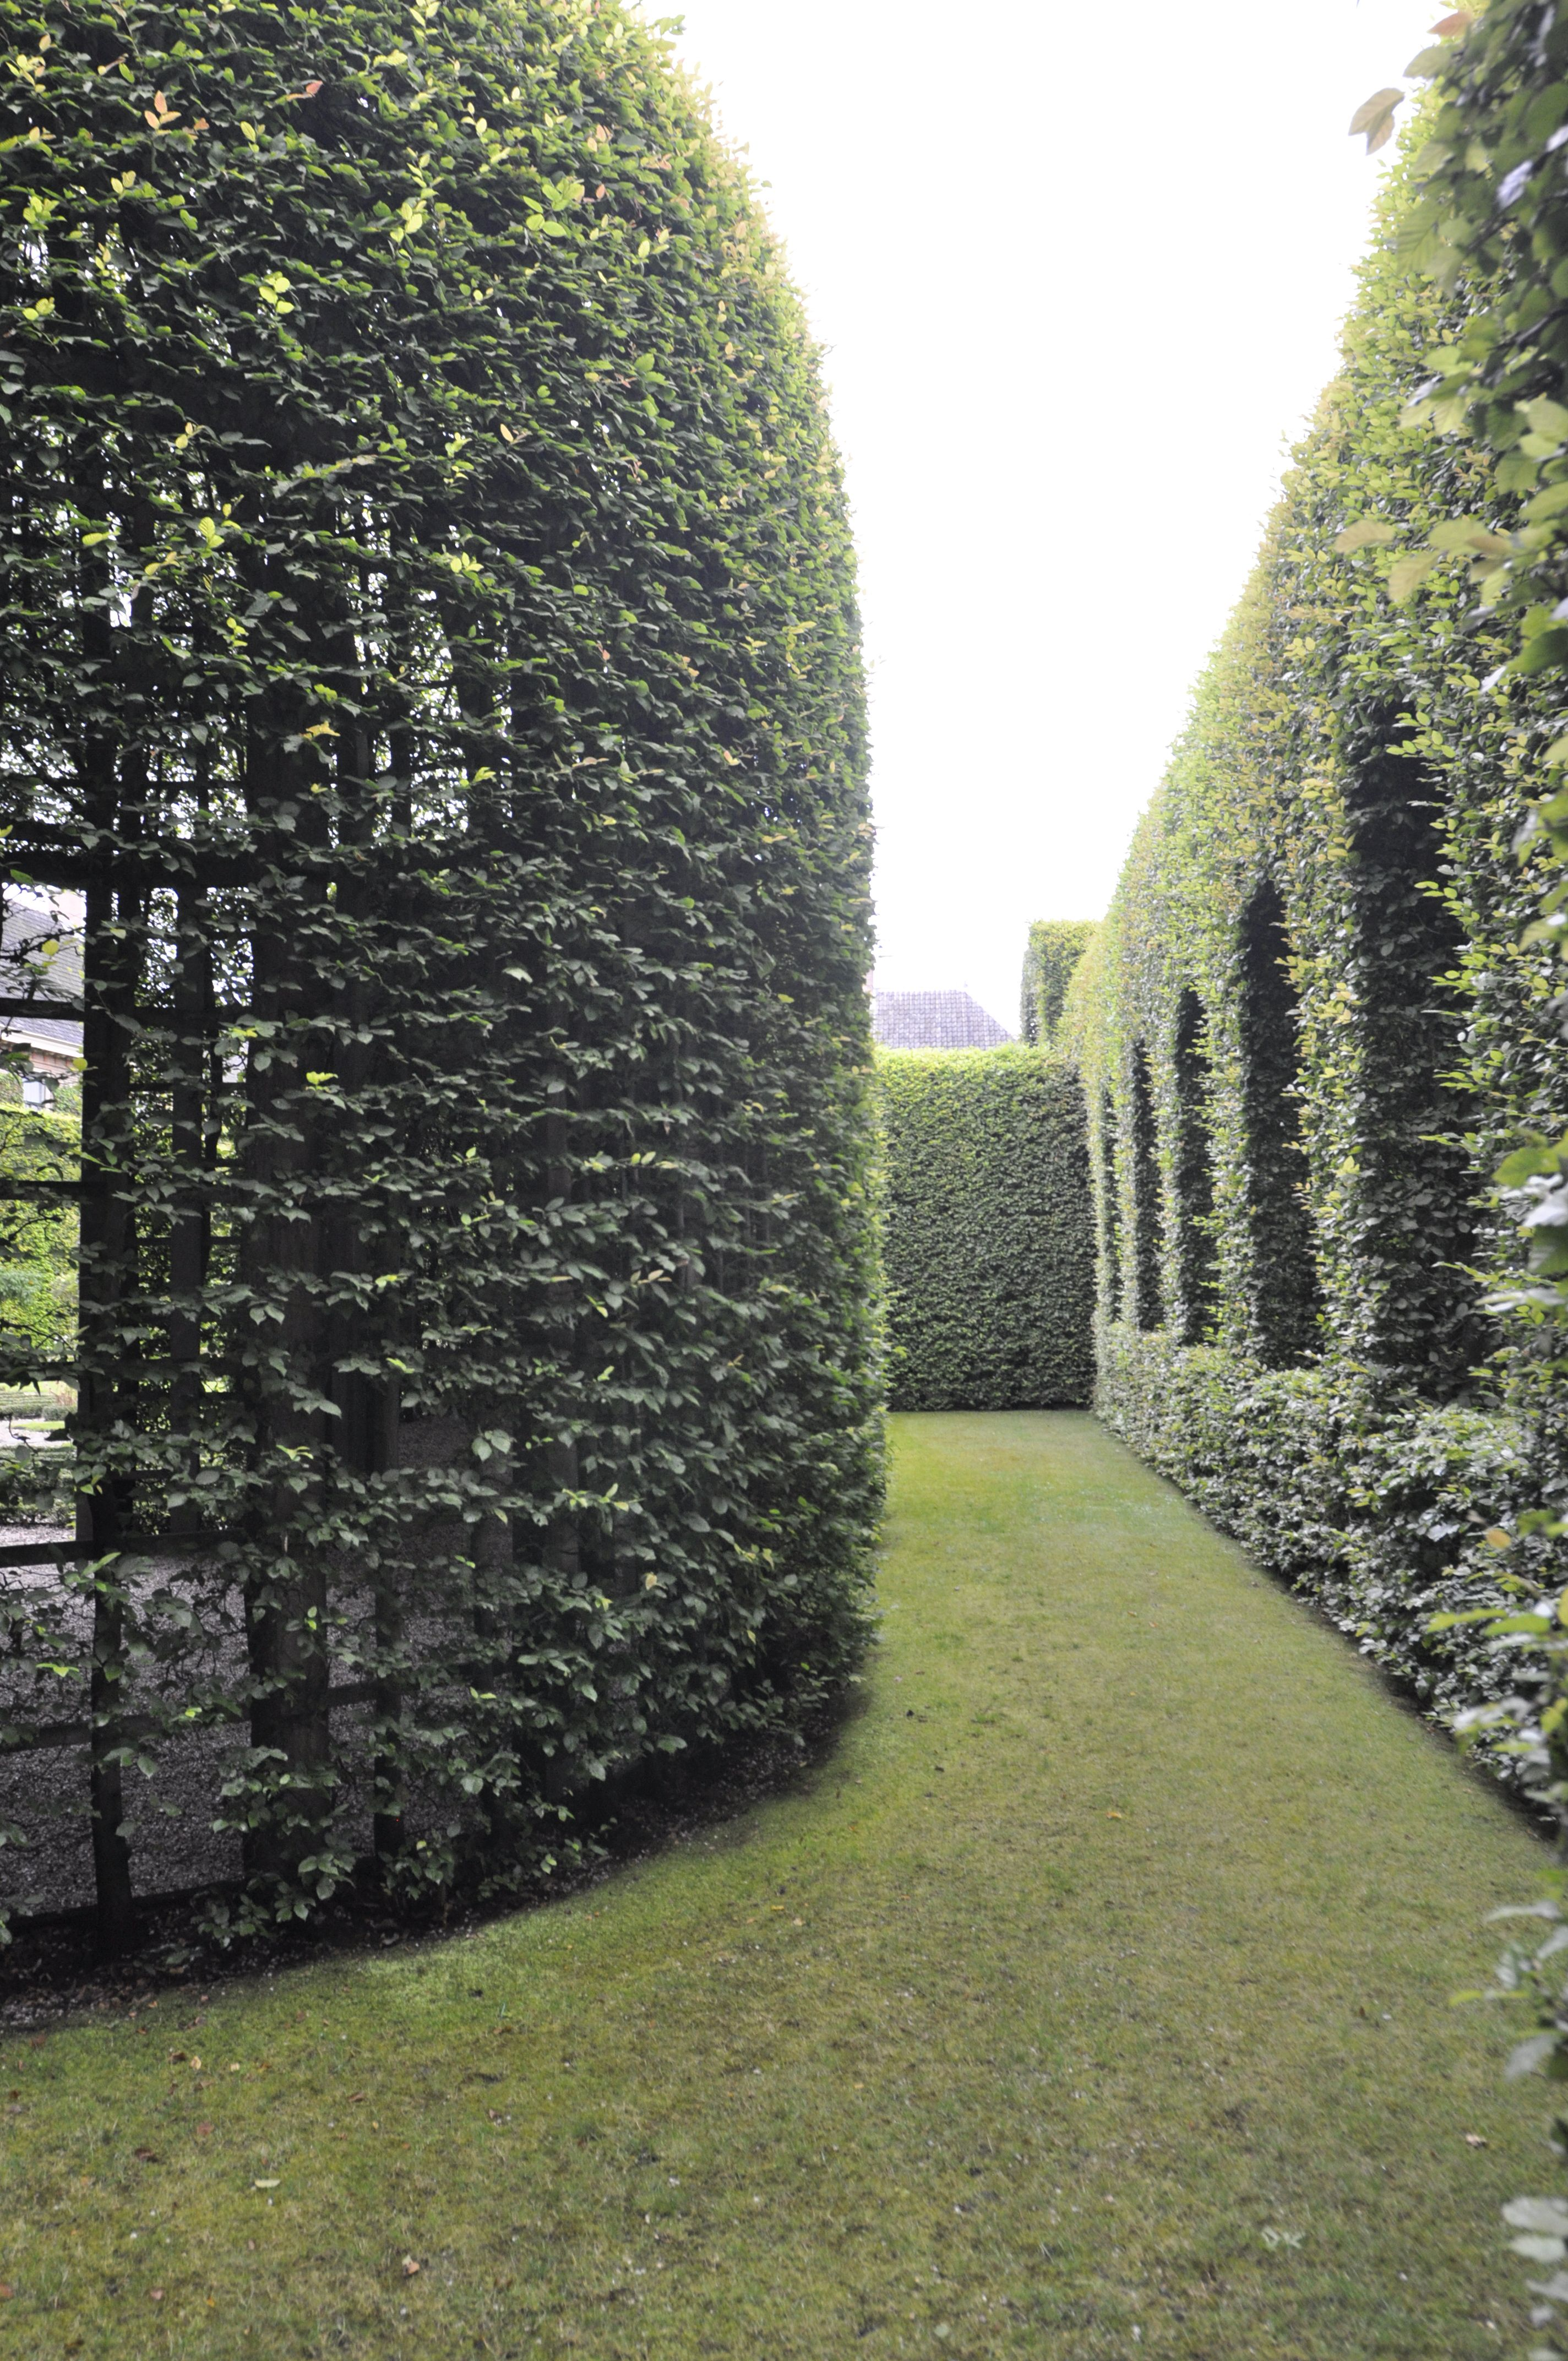 Garden inspiration palace het loo thinking outside the boxwood